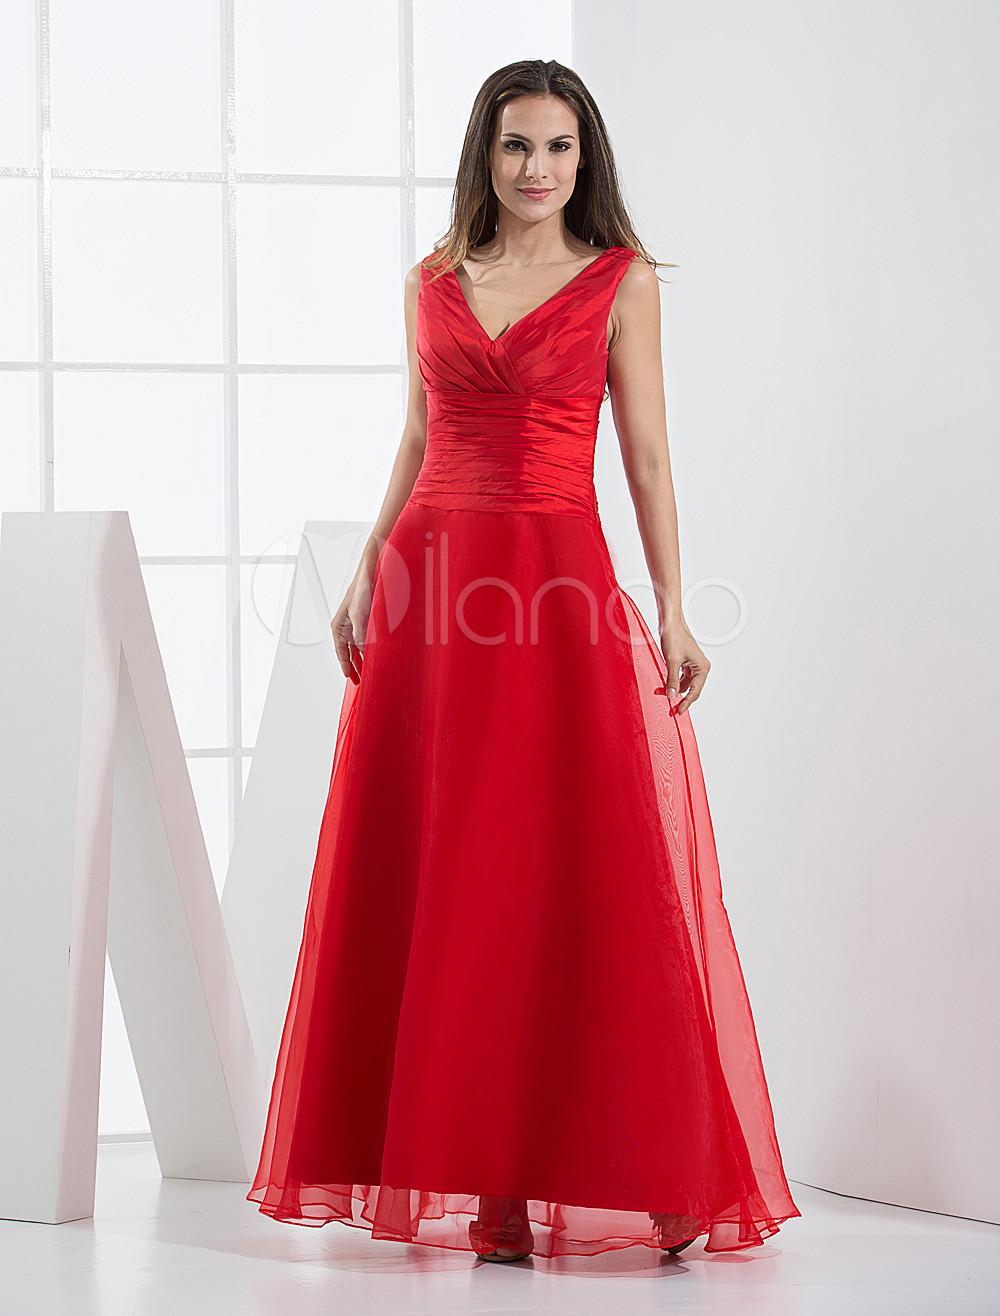 Red V-Neck Pleated Floor Length Organza Satin Bridesmaid Dress